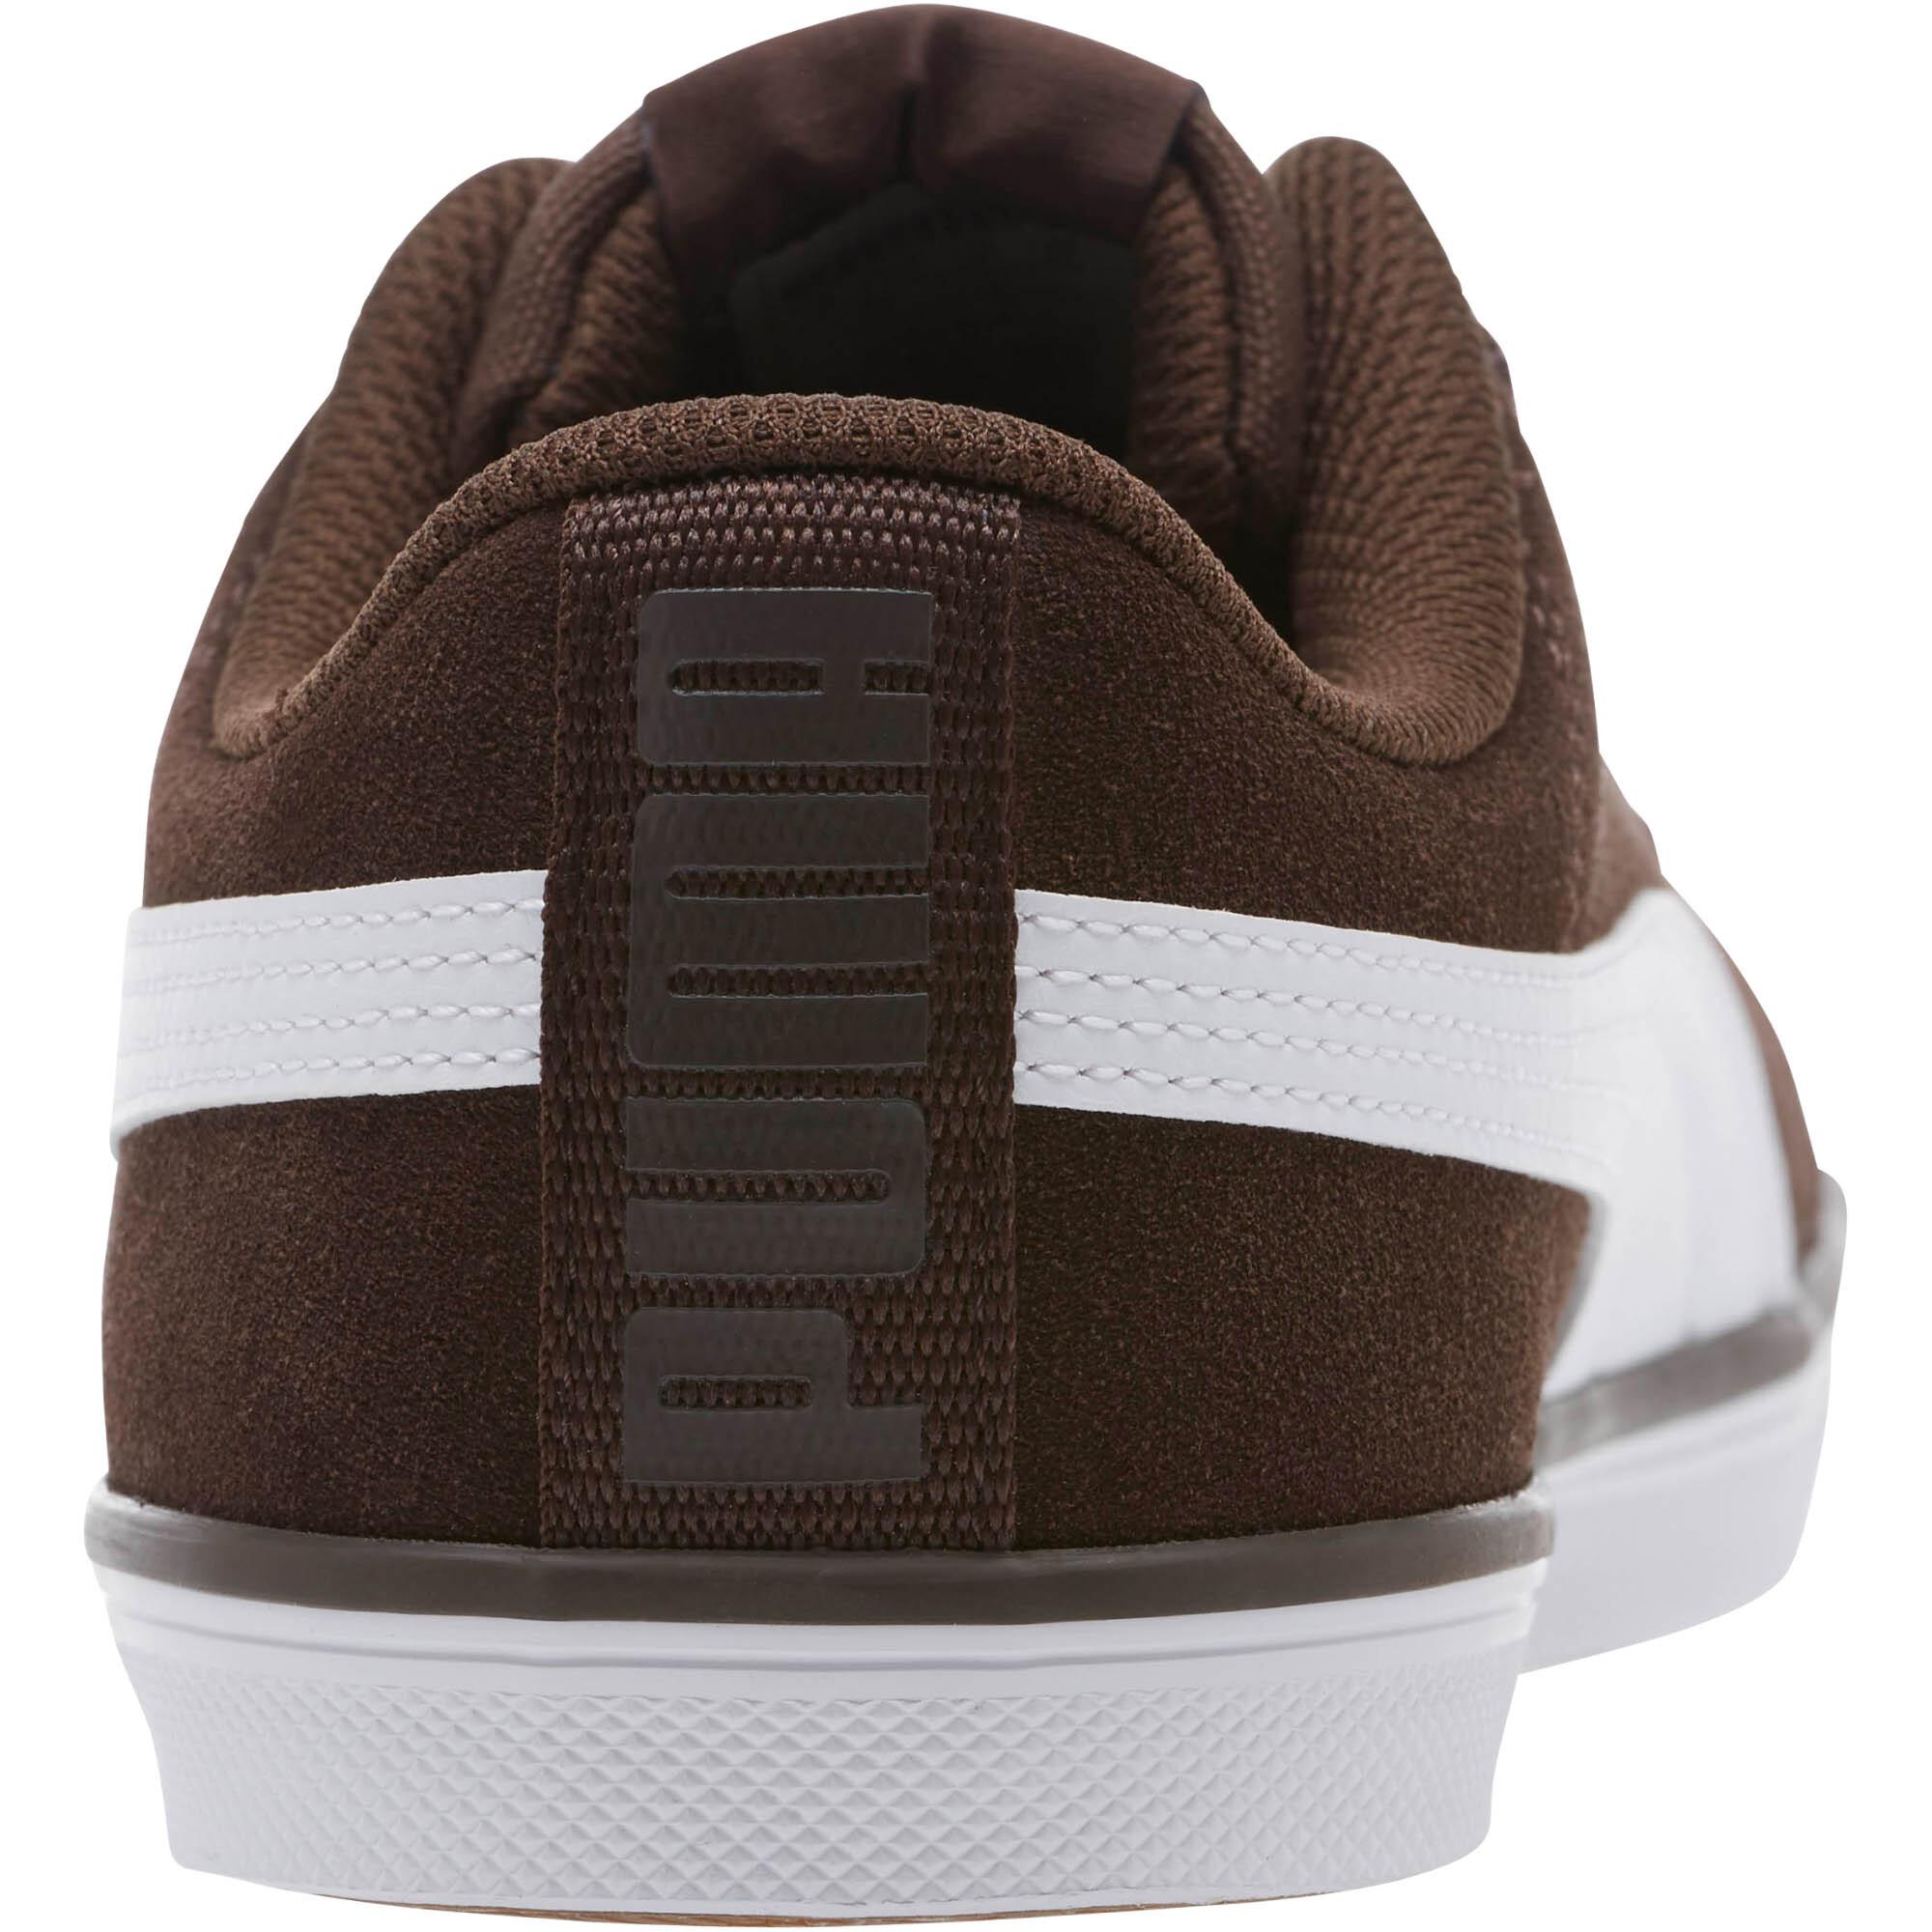 PUMA-Urban-Plus-Suede-Sneakers-Men-Shoe-Basics thumbnail 5